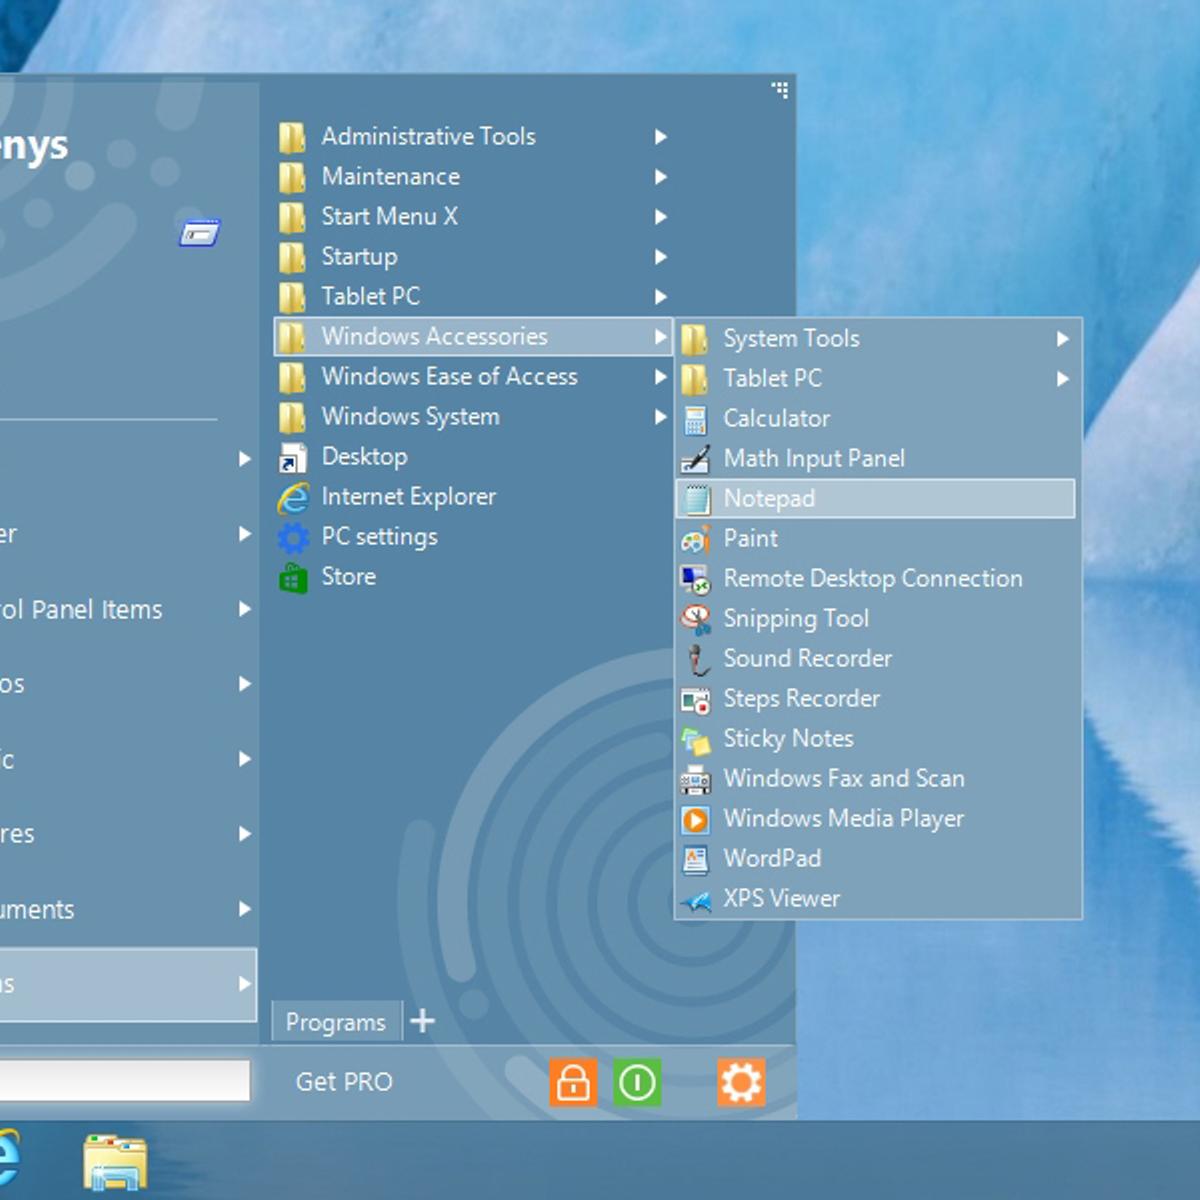 Start Menu X Alternatives and Similar Software